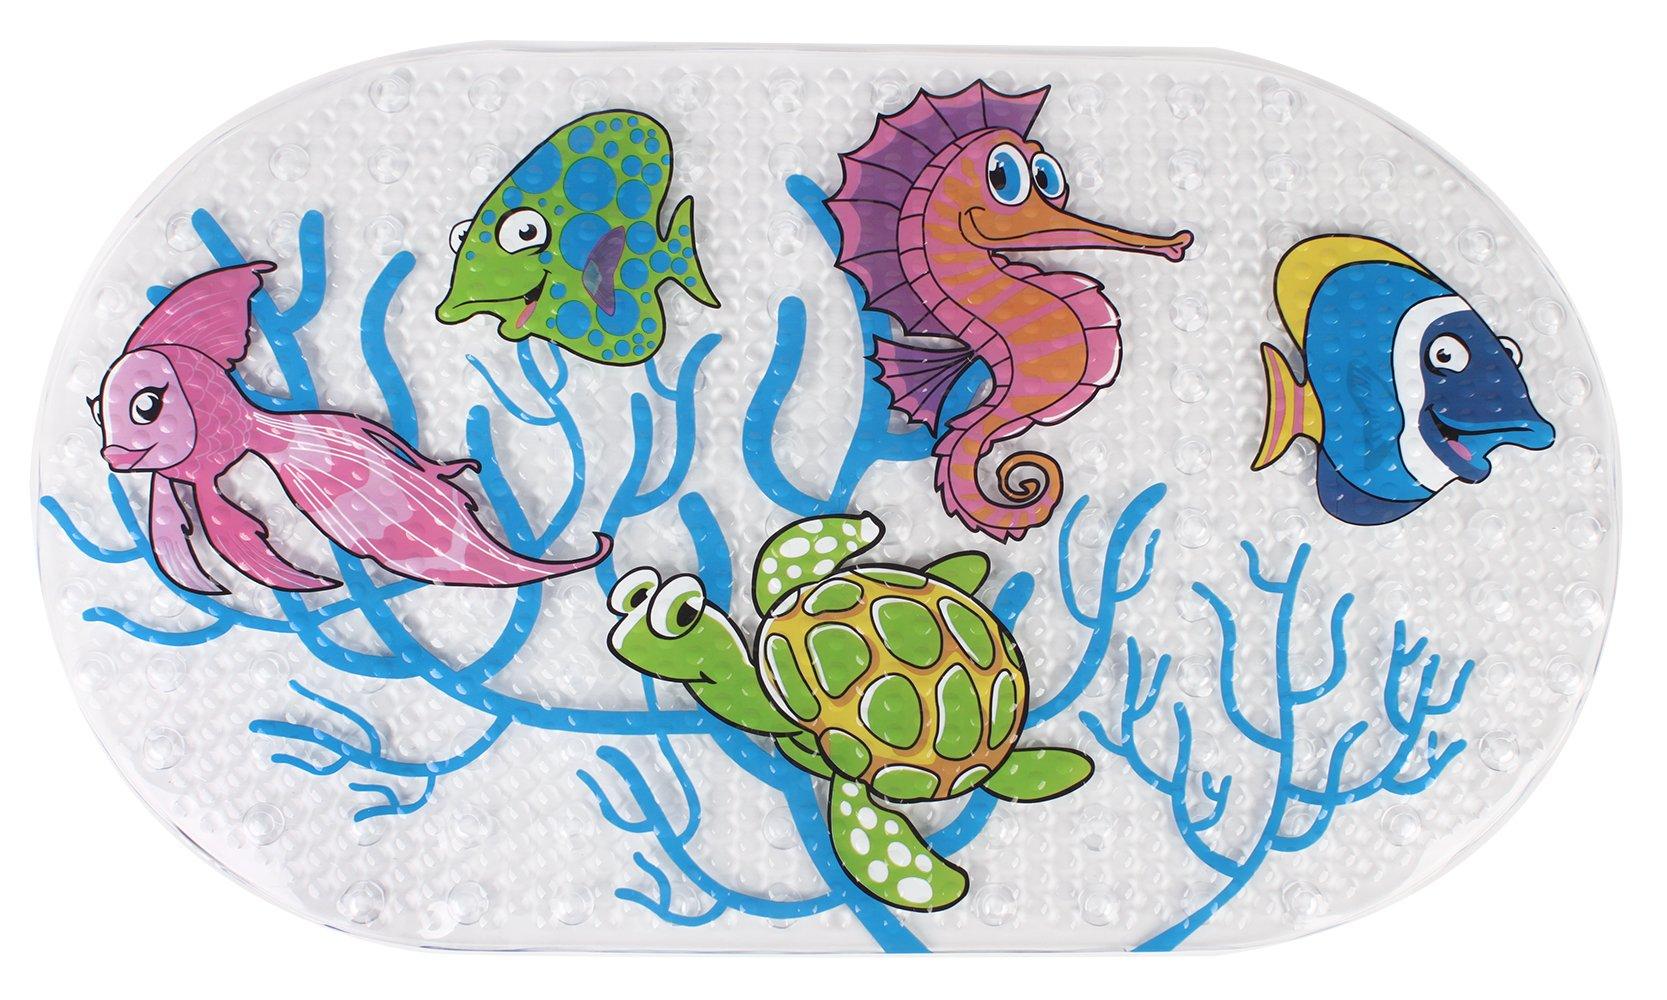 Yimobra Original Bath tub and Shower Mat for Kids Anti Bacterial,Phthalate Free,Latex and Machine Washable Cartoon Pattern Mats Materials,(Baby 27x15 Inch, Fish)